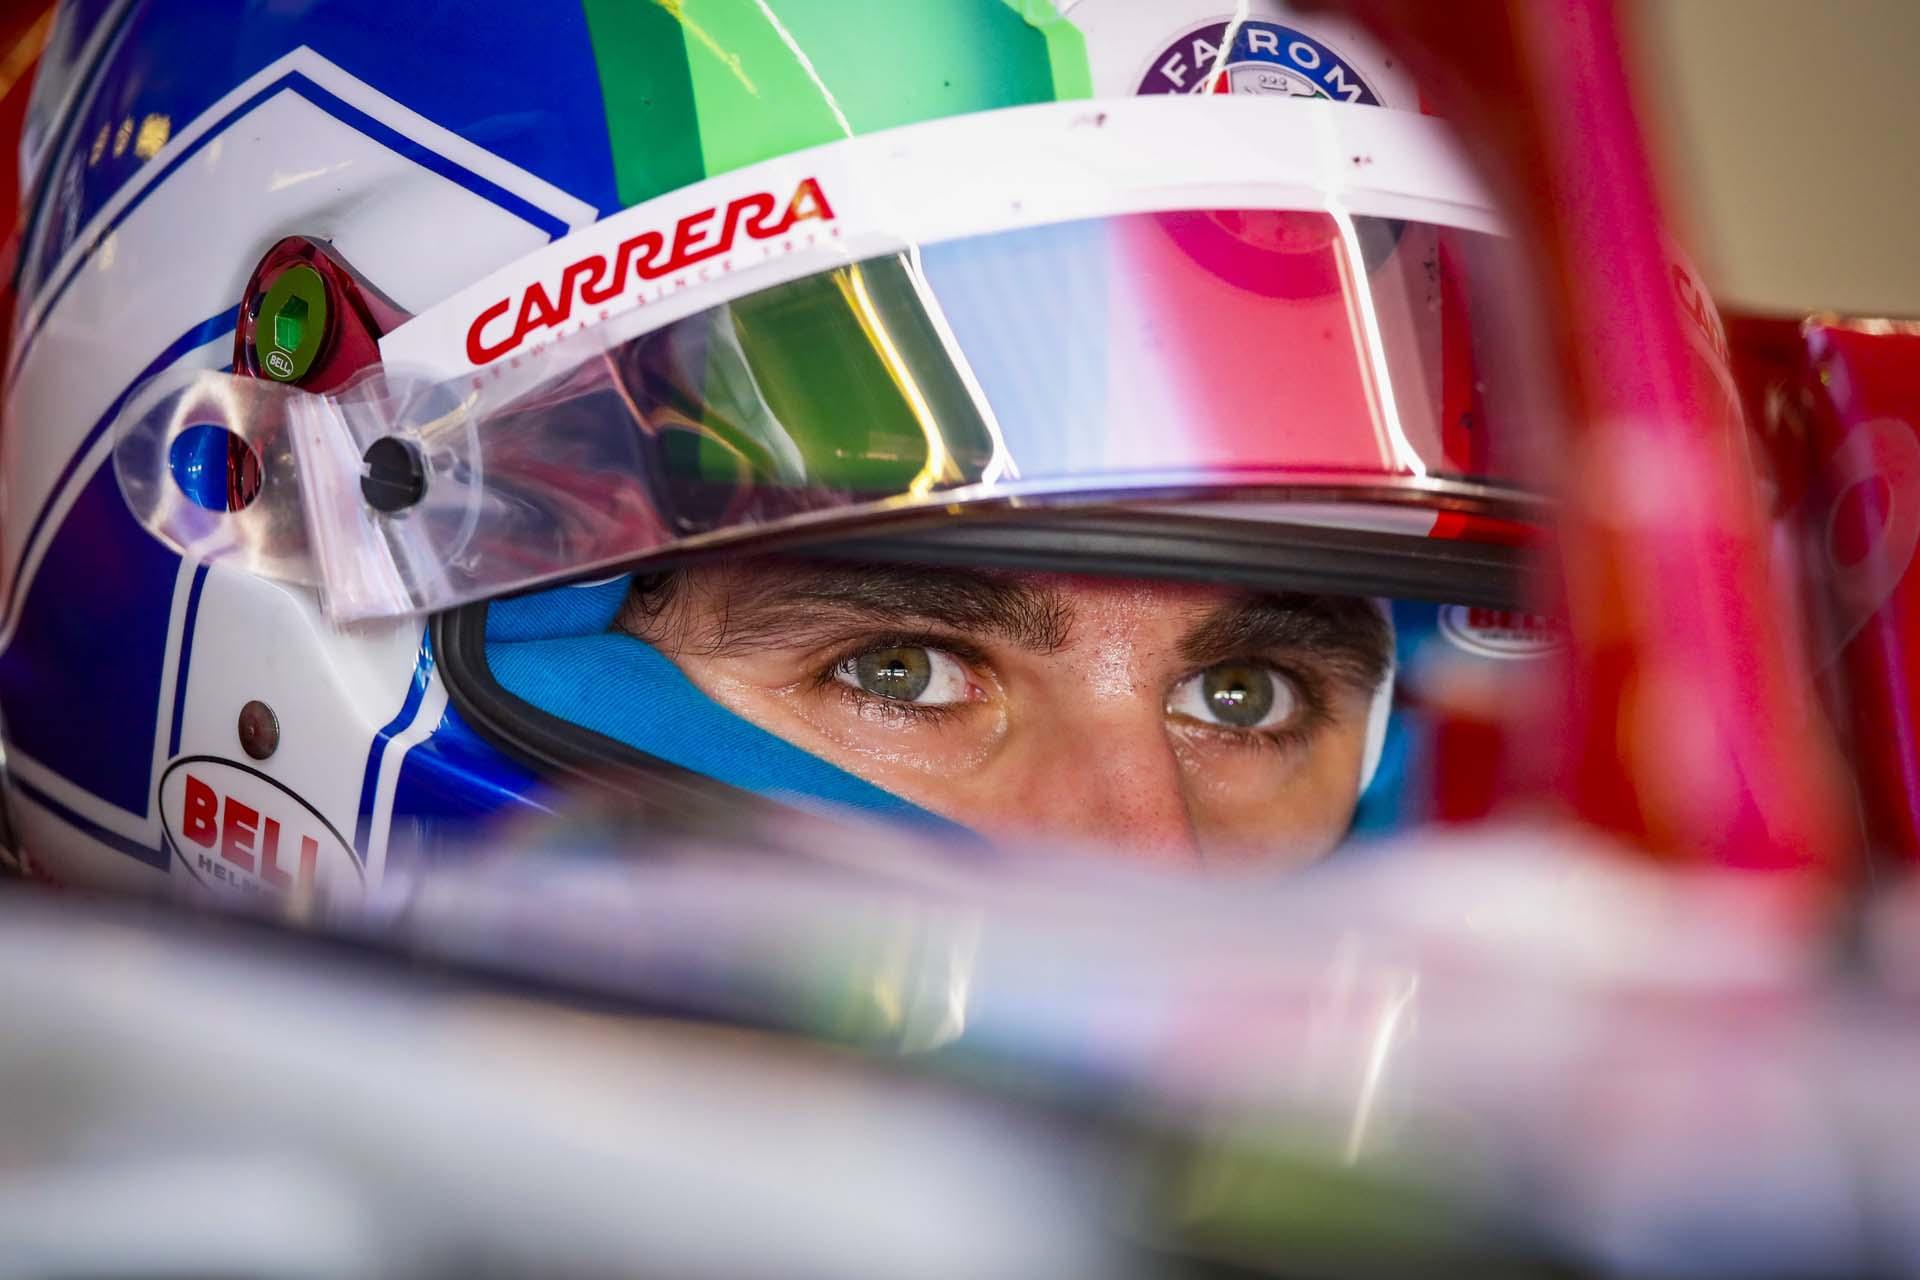 F1 - ABU DHABI GRAND PRIX 2019